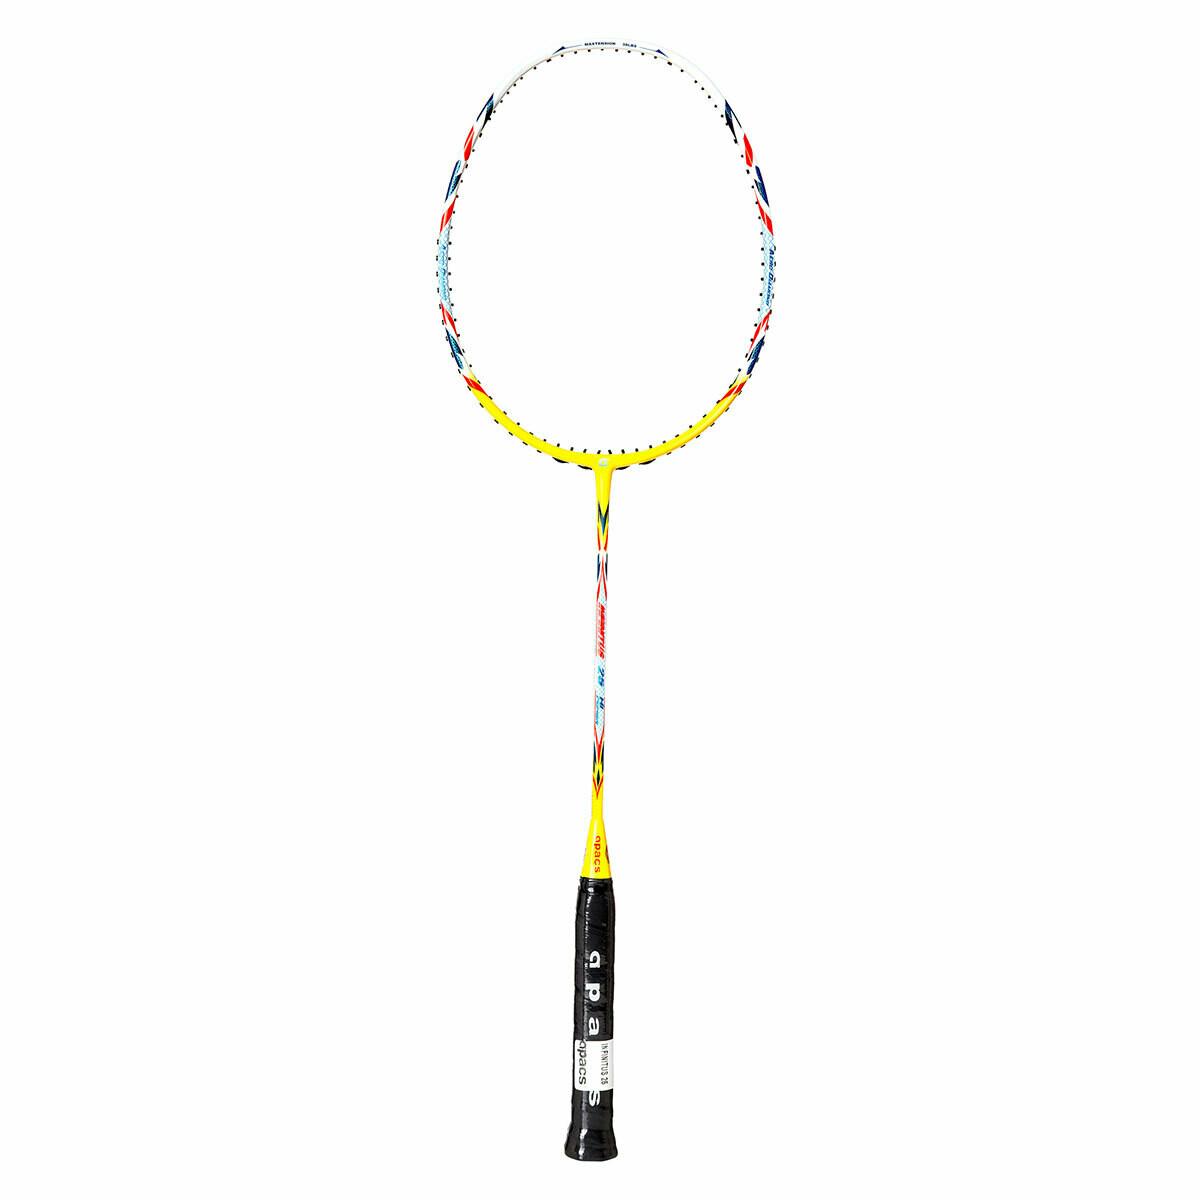 Apacs Infinitus 25 Badminton Racquet- with Full Cover